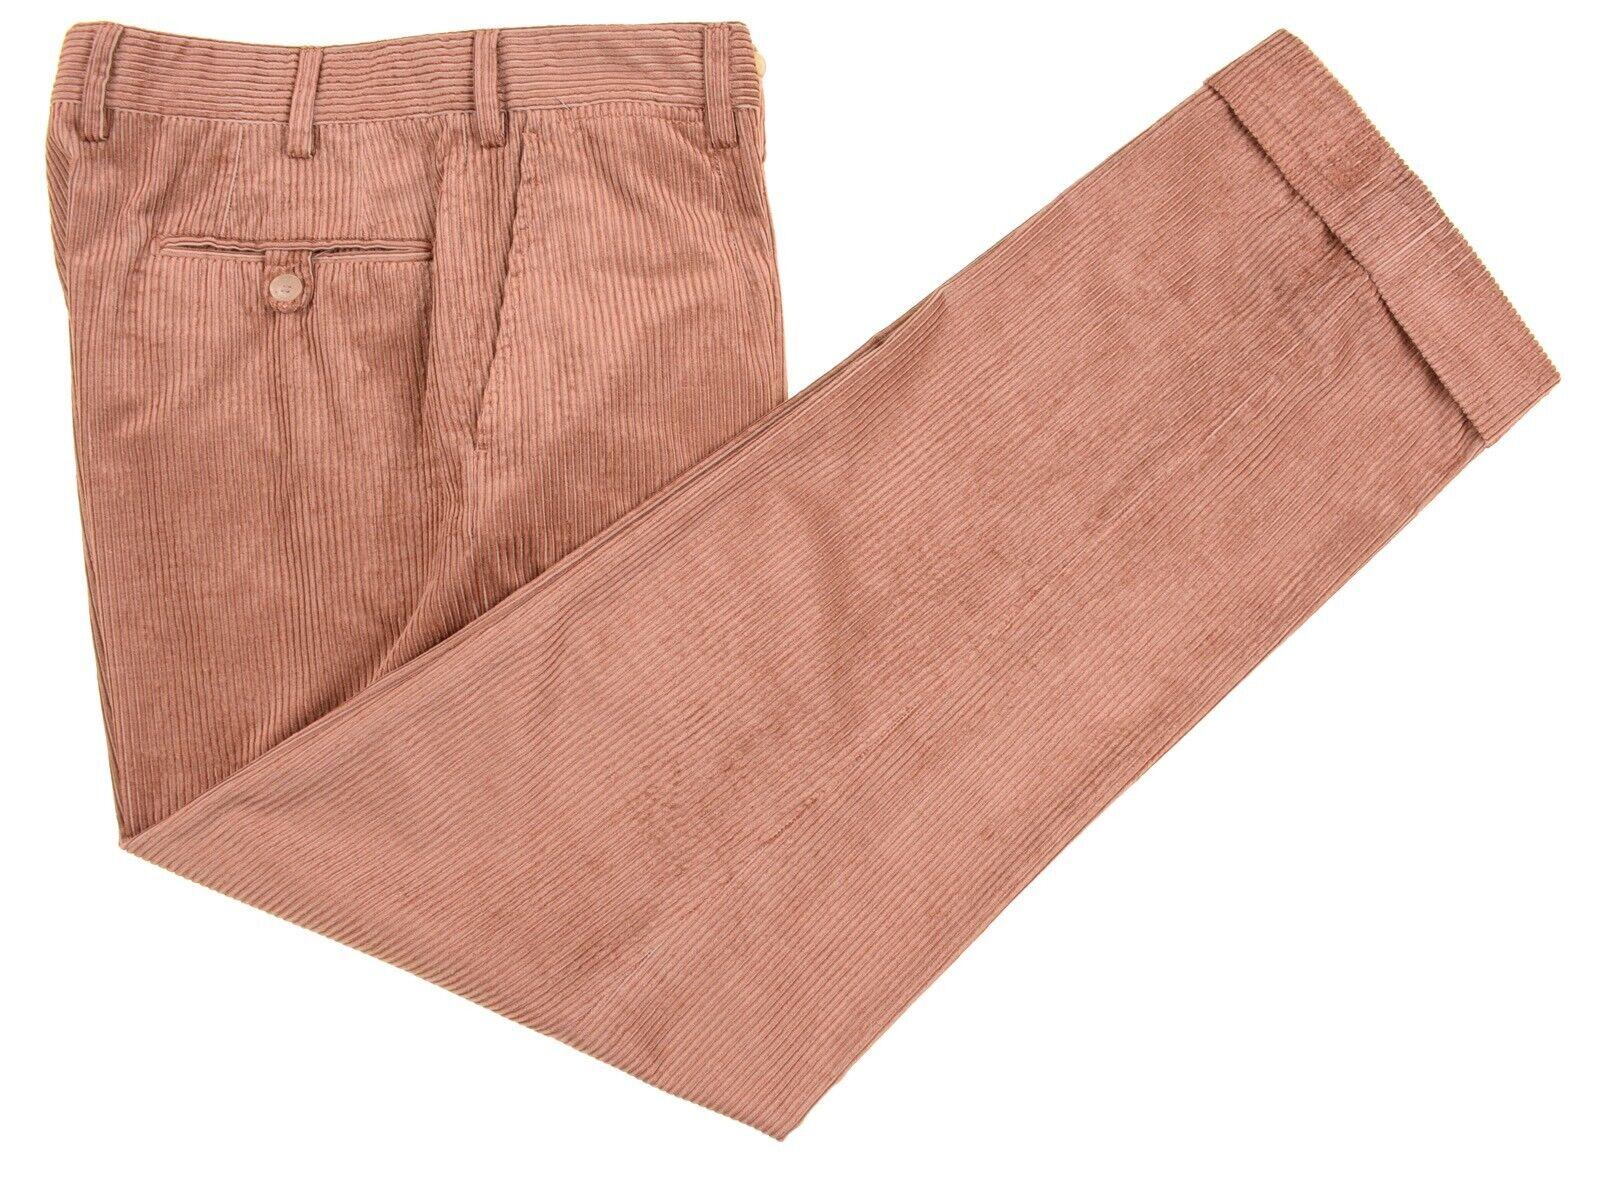 Isaia Napoli Sciammeria  Bamboo Copper naranja Corduroy Dress Pants 32 x 31  promociones emocionantes